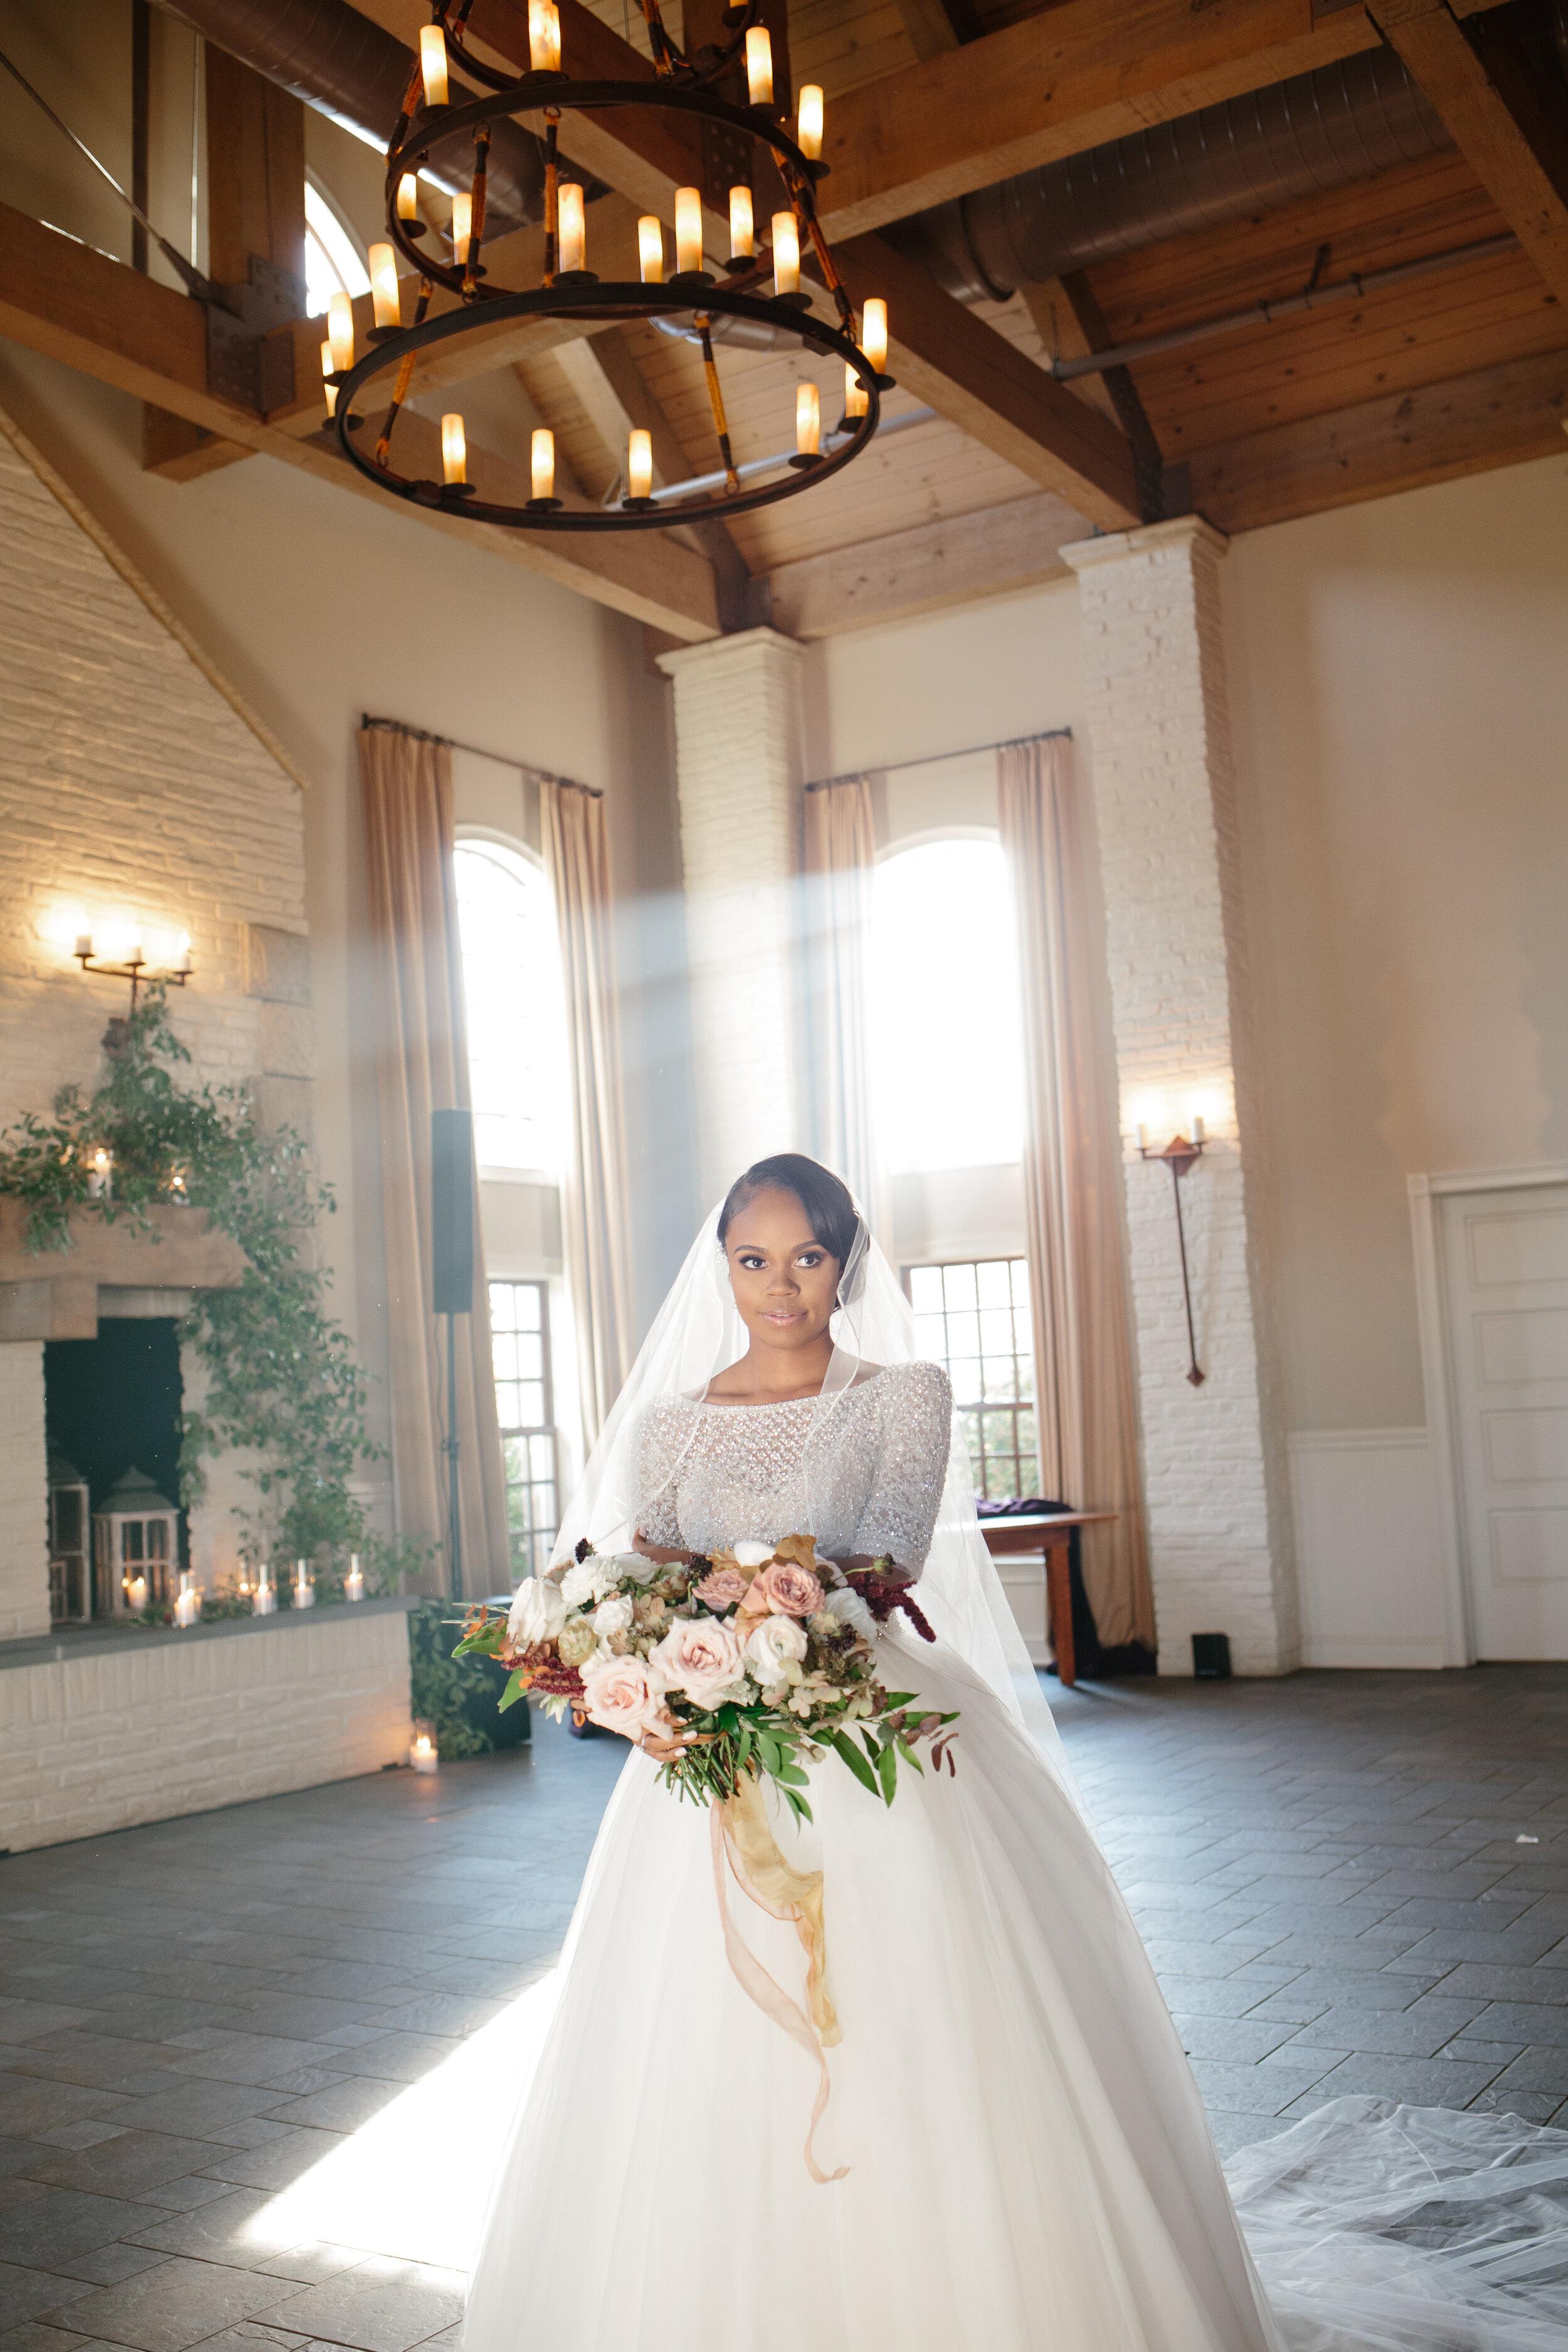 Shante-Asteway-Wedding-Andrew-Roby-Events-10.jpg